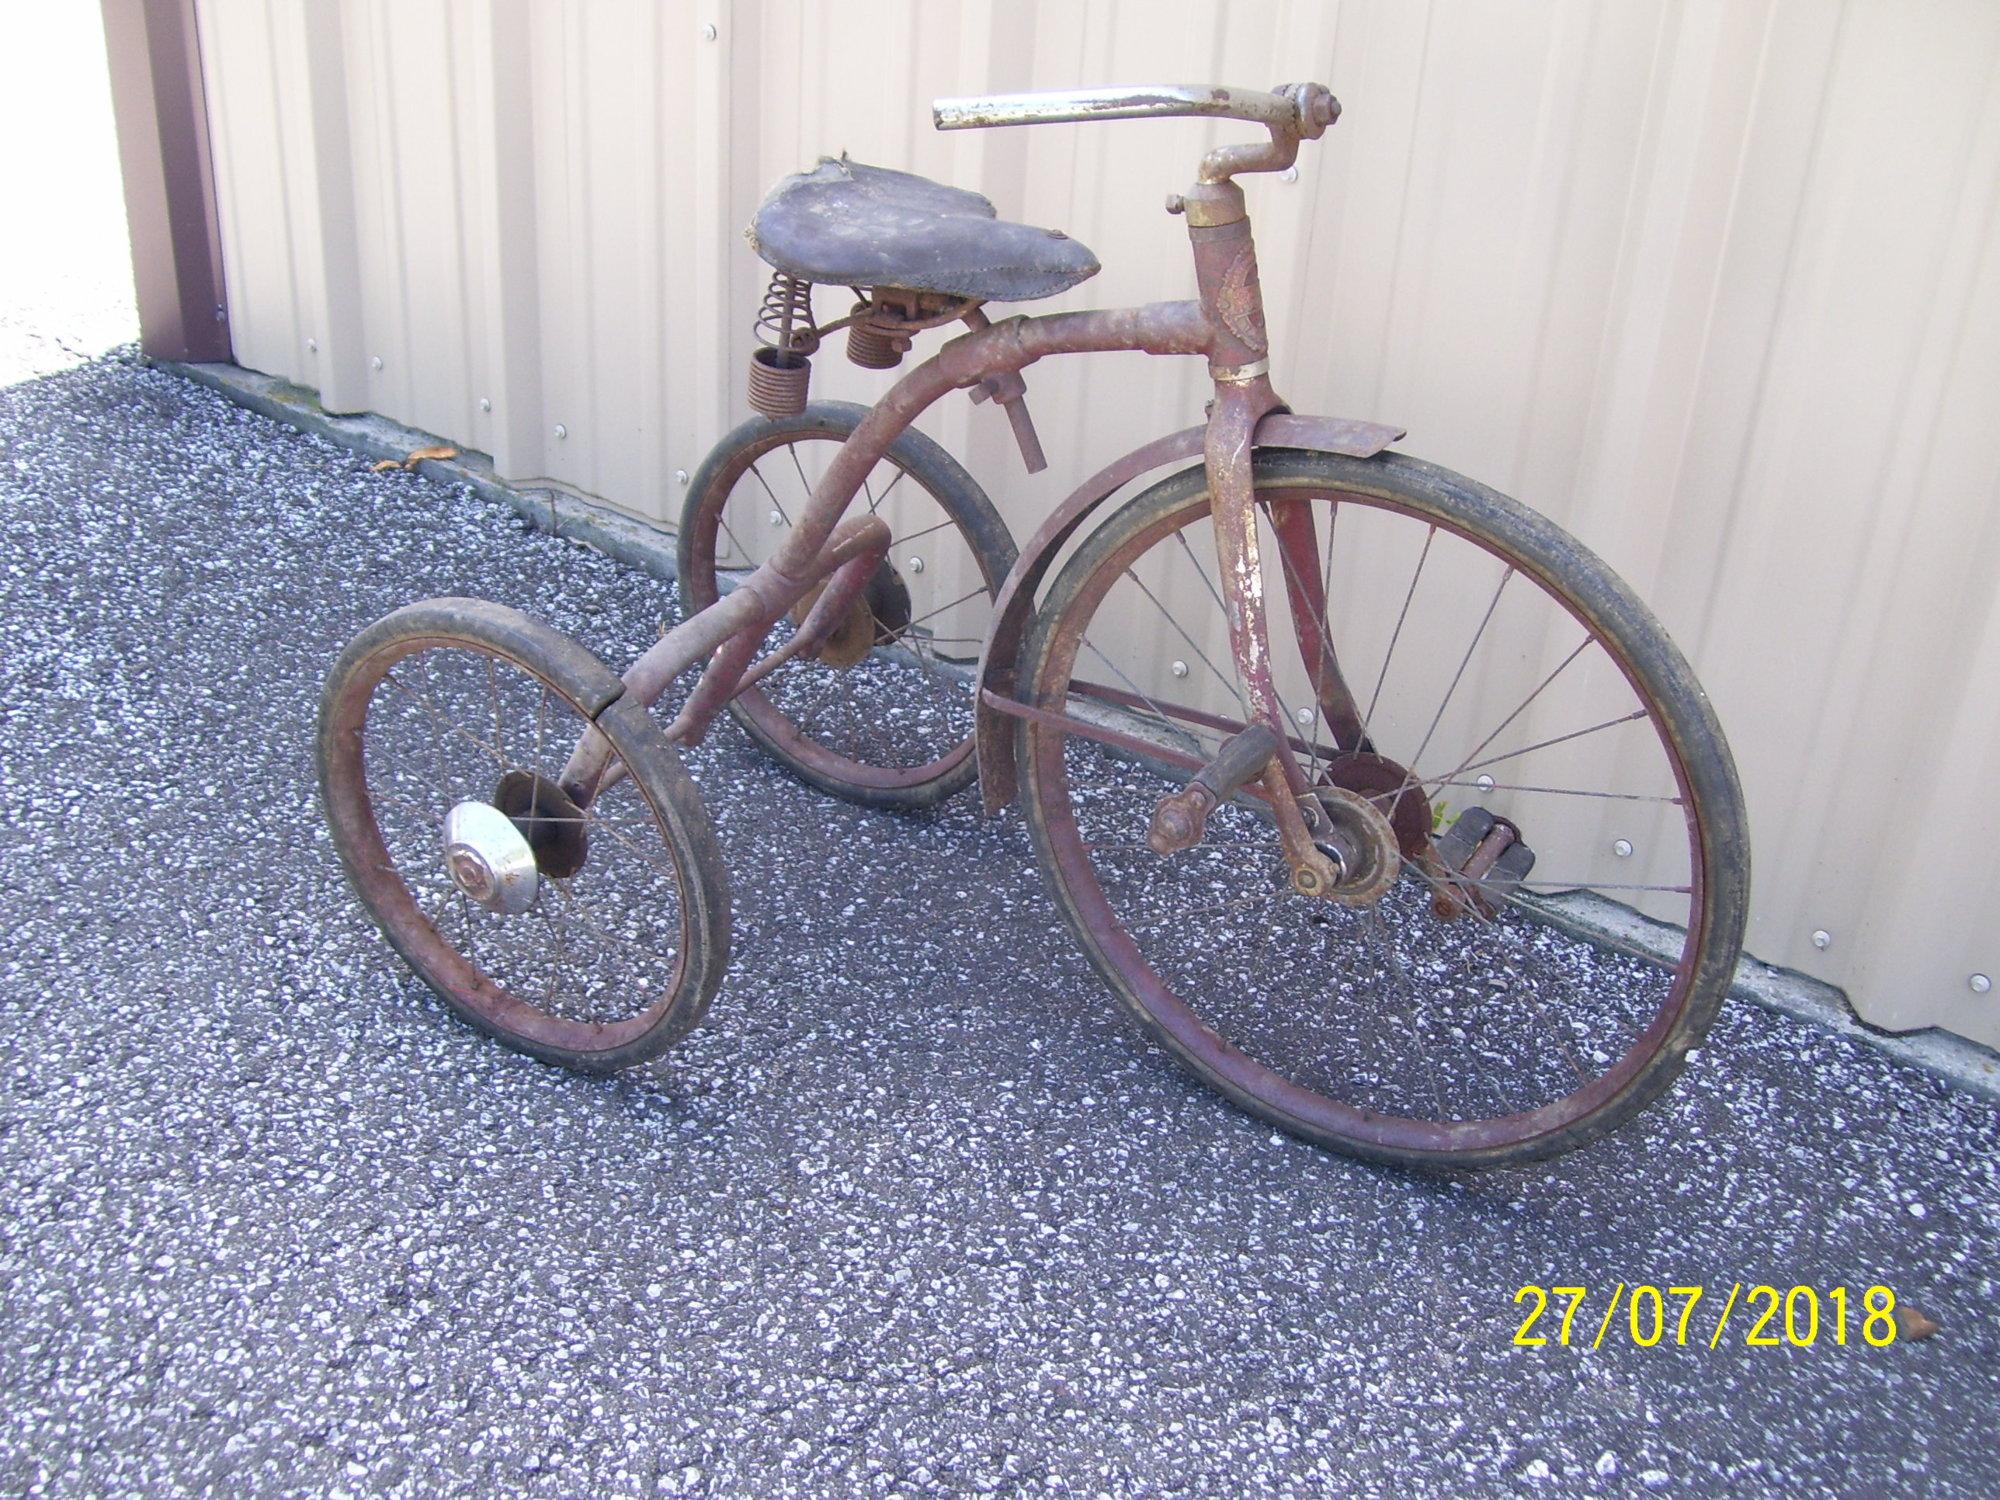 evans bikes 005.JPG